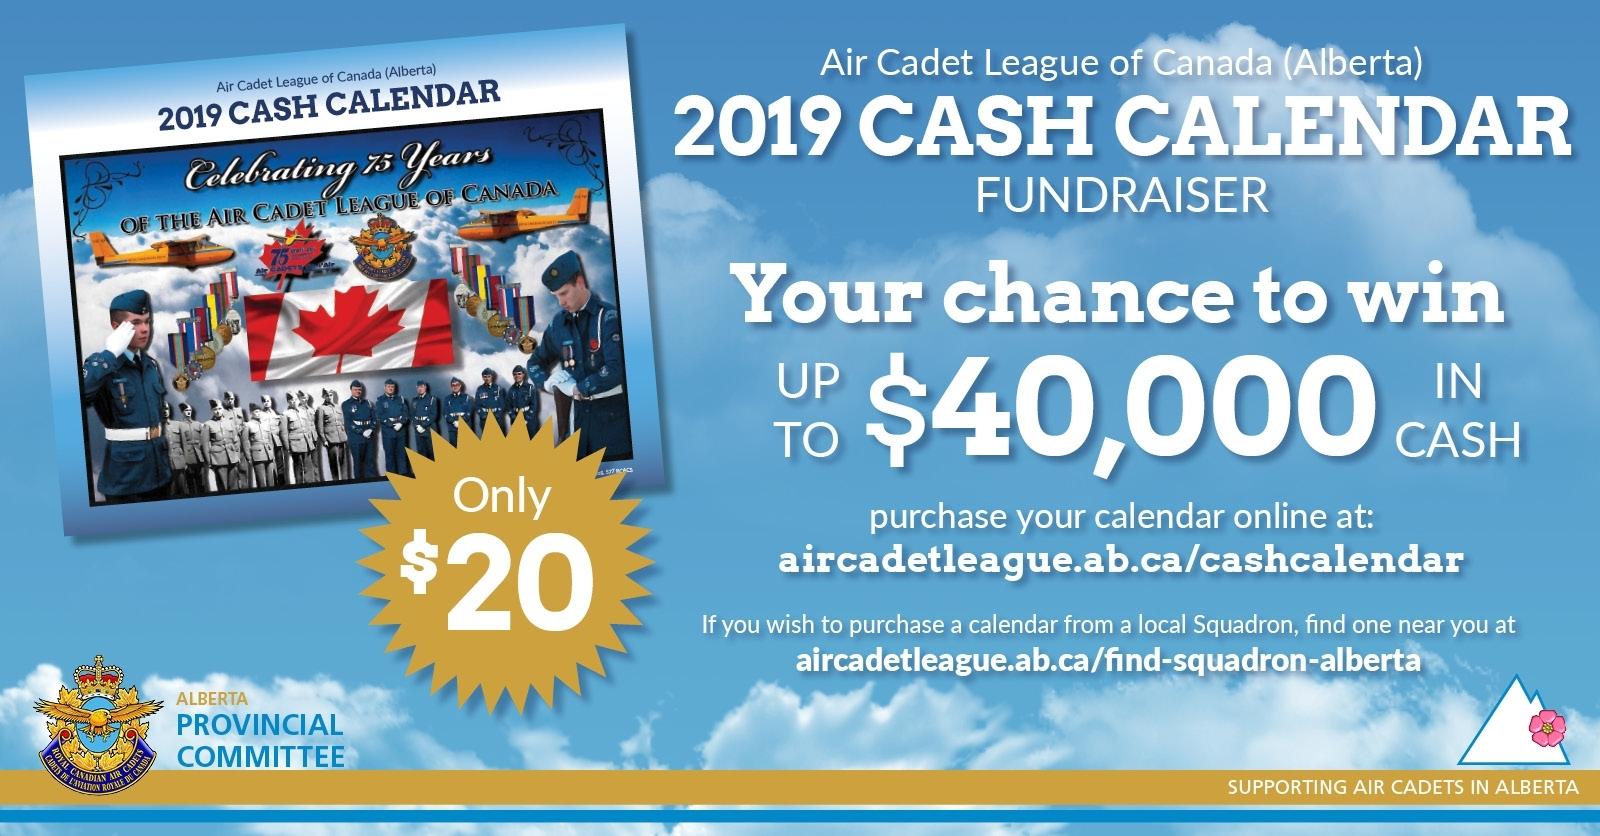 2019 Cash Calendar Fundraiser | Alberta Provincial Committee